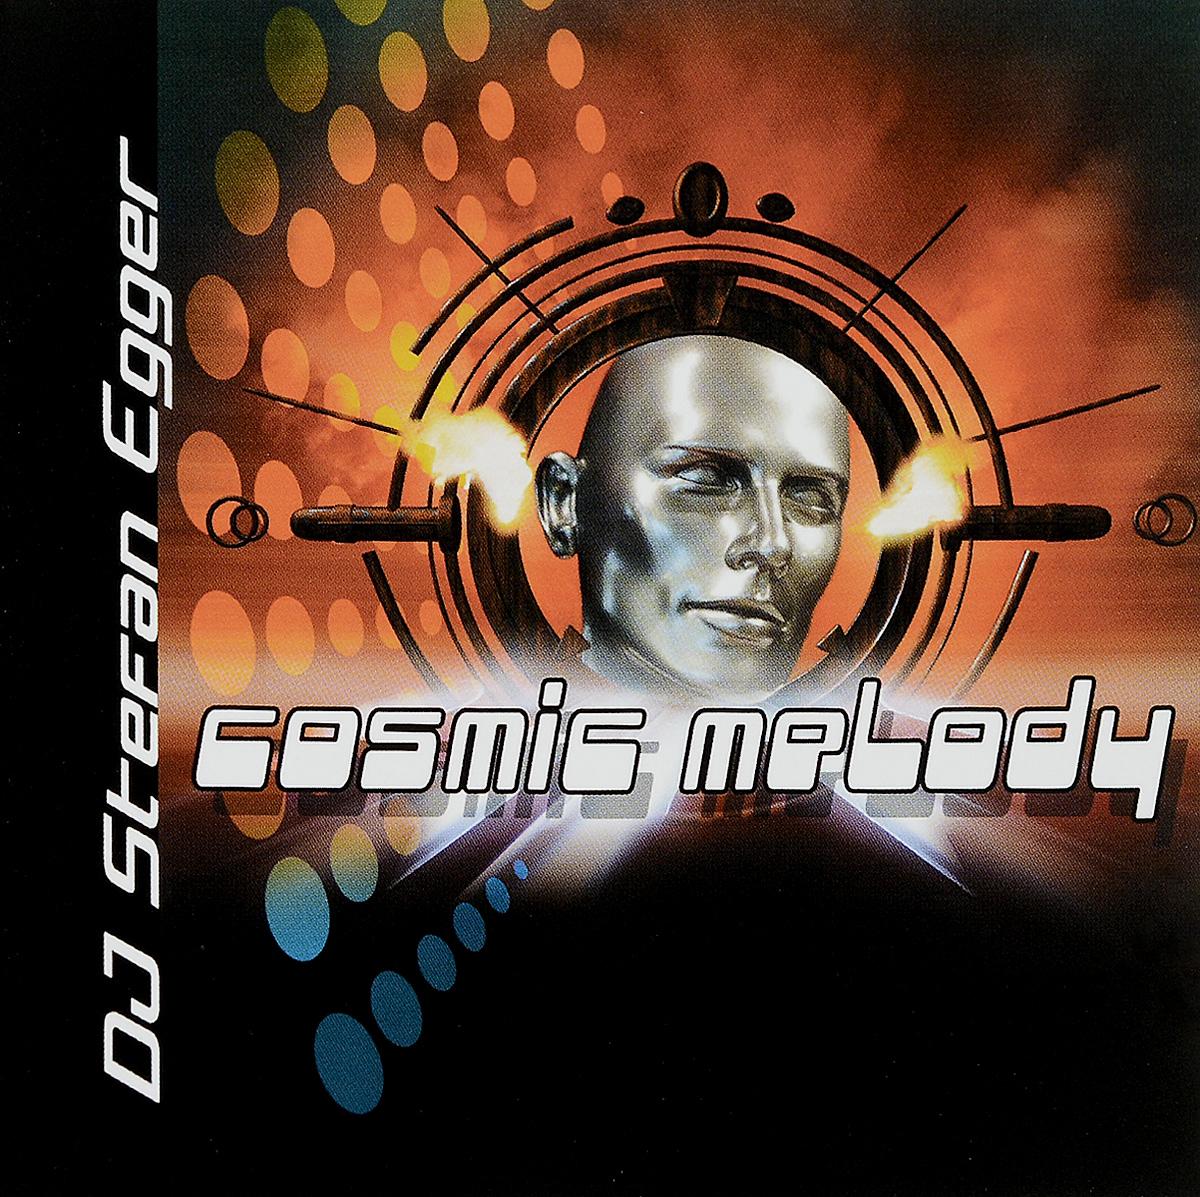 DJ Stefan Egger. Cosmic Melody (CD) 2005 Audio CD